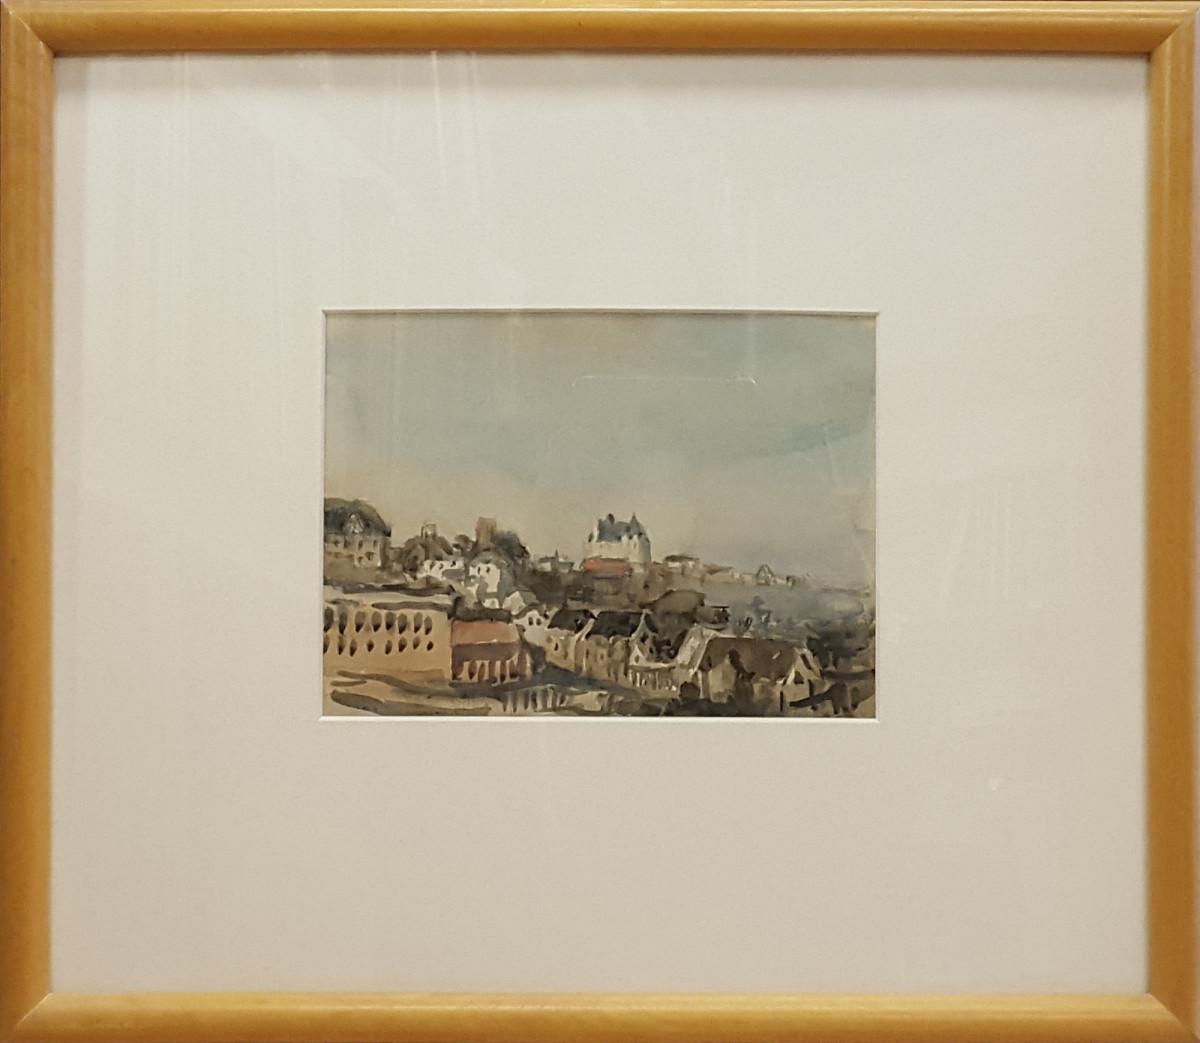 2375 - View from the Parliament, Edmonton by Llewellyn Petley-Jones (1908-1986)